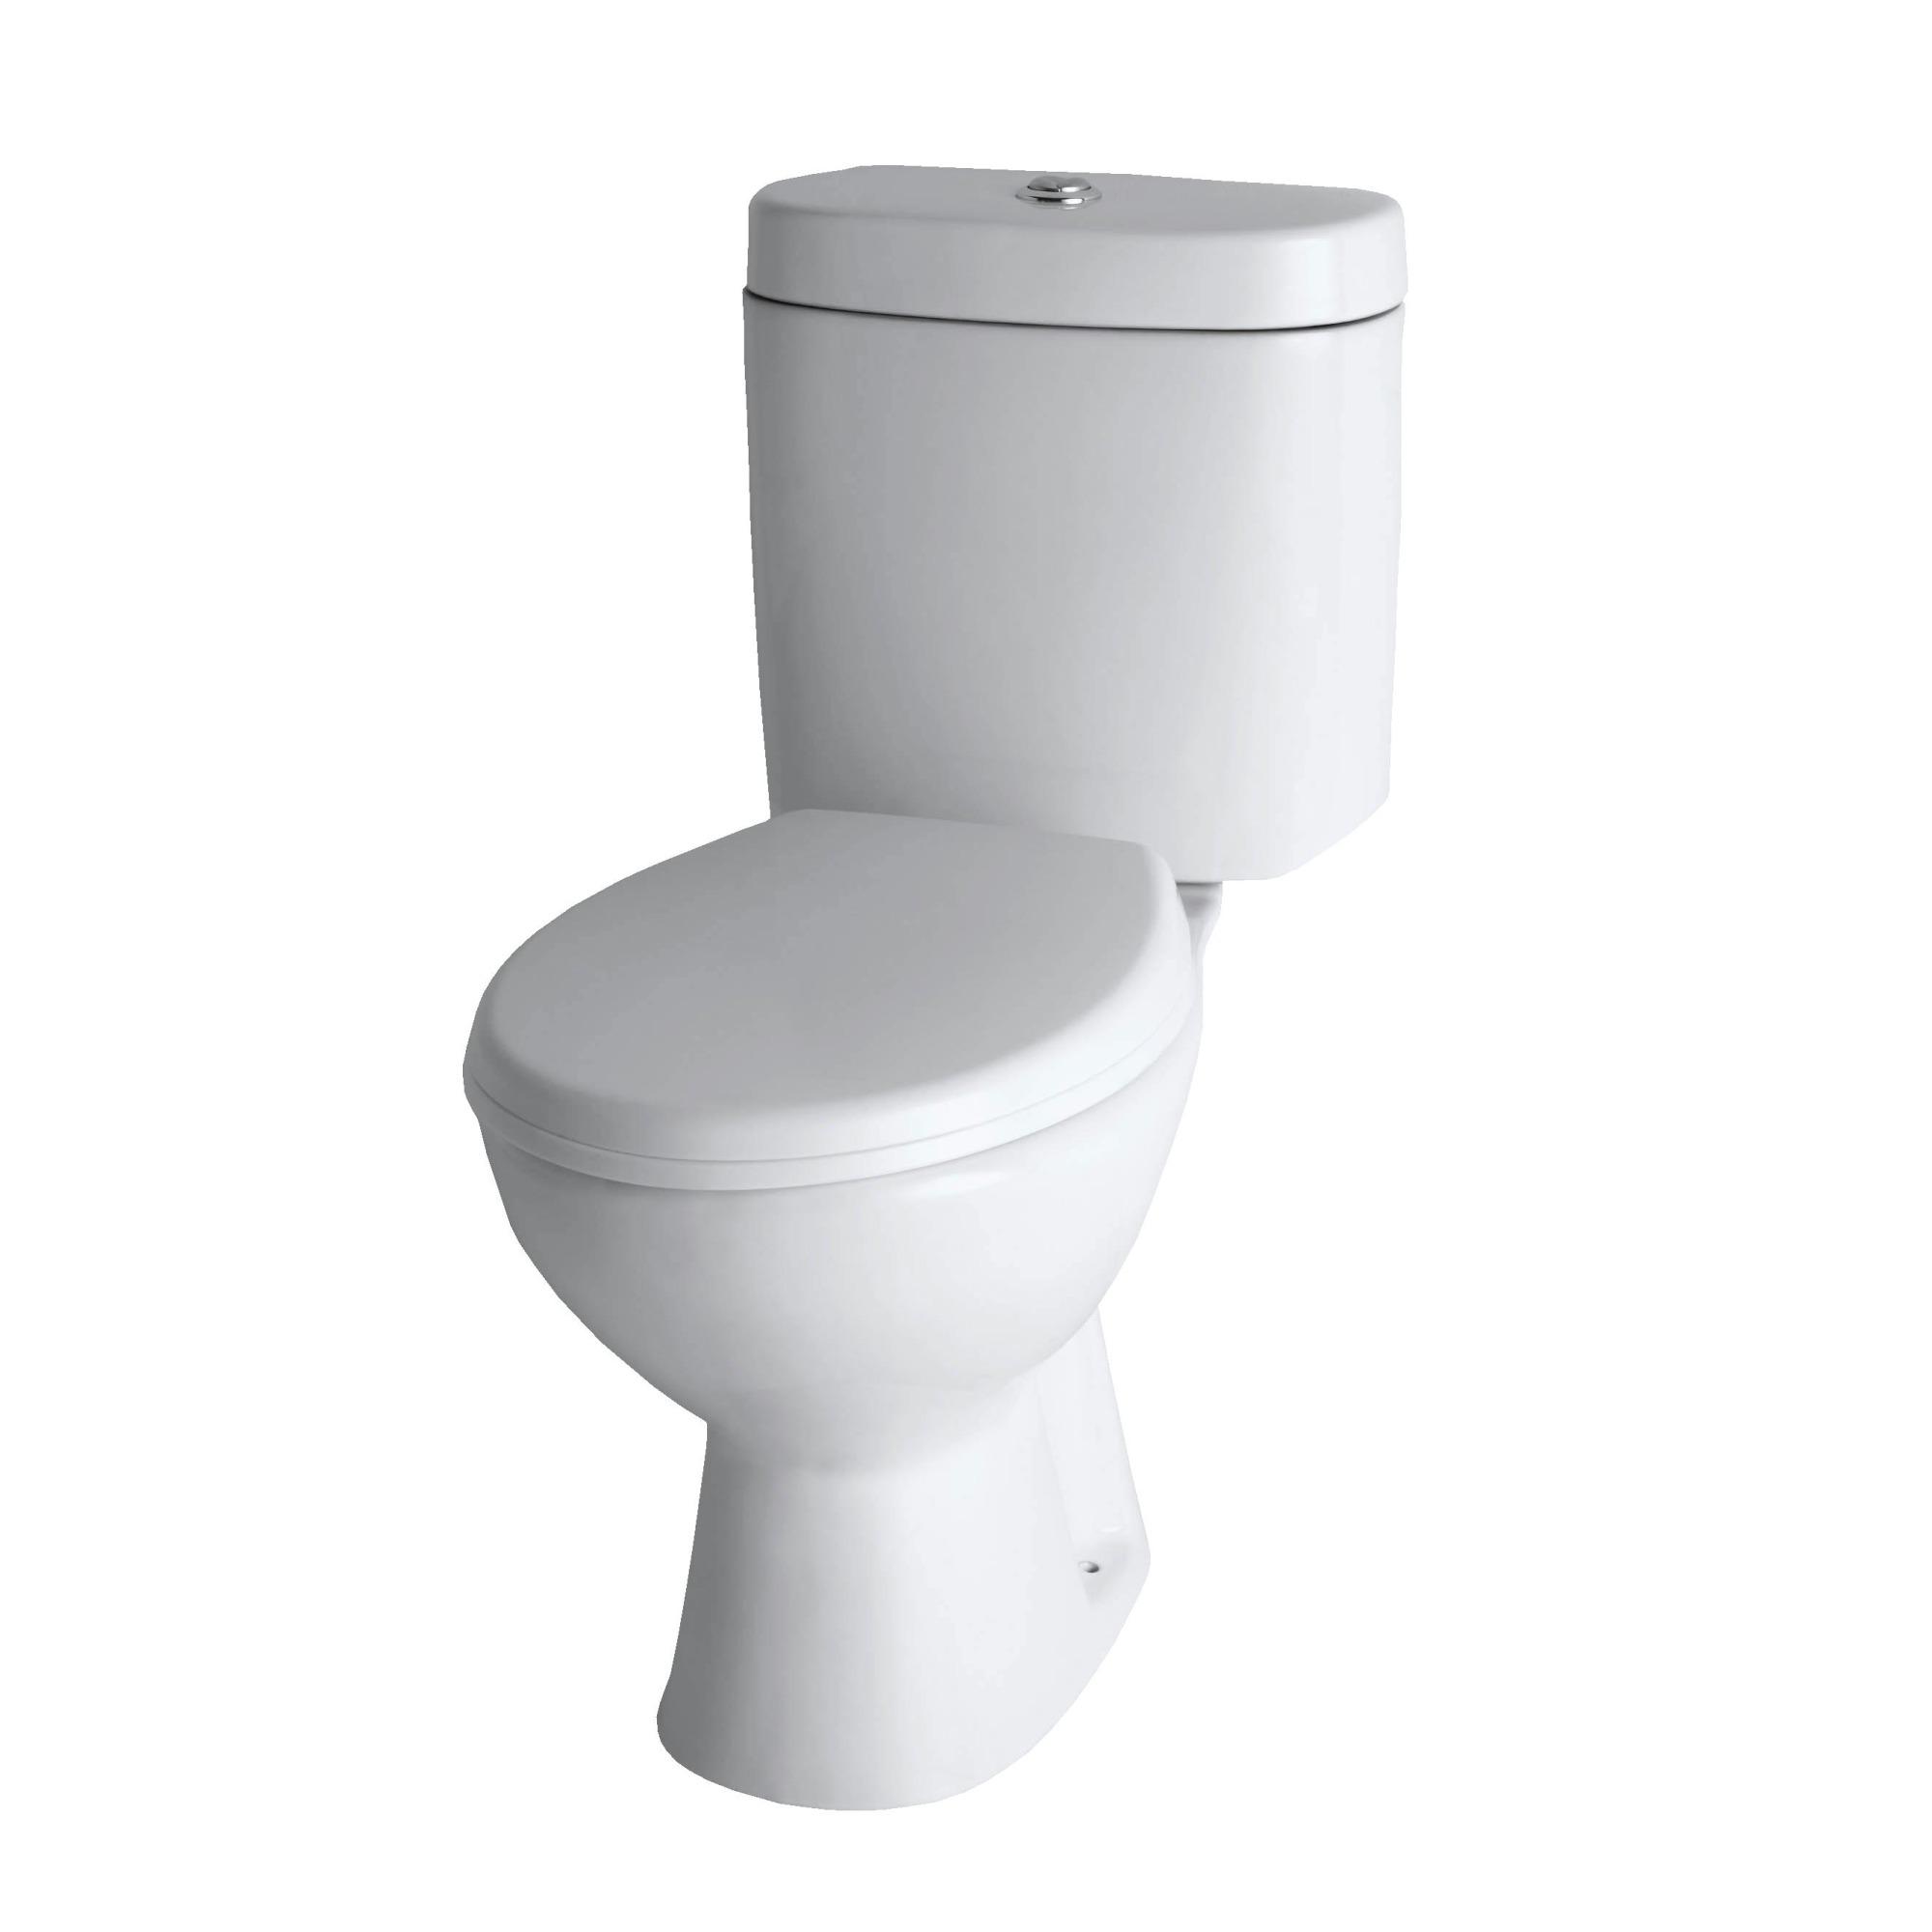 lafiness pack wc geberit flush 3 6l sortie ca sol blanc. Black Bedroom Furniture Sets. Home Design Ideas